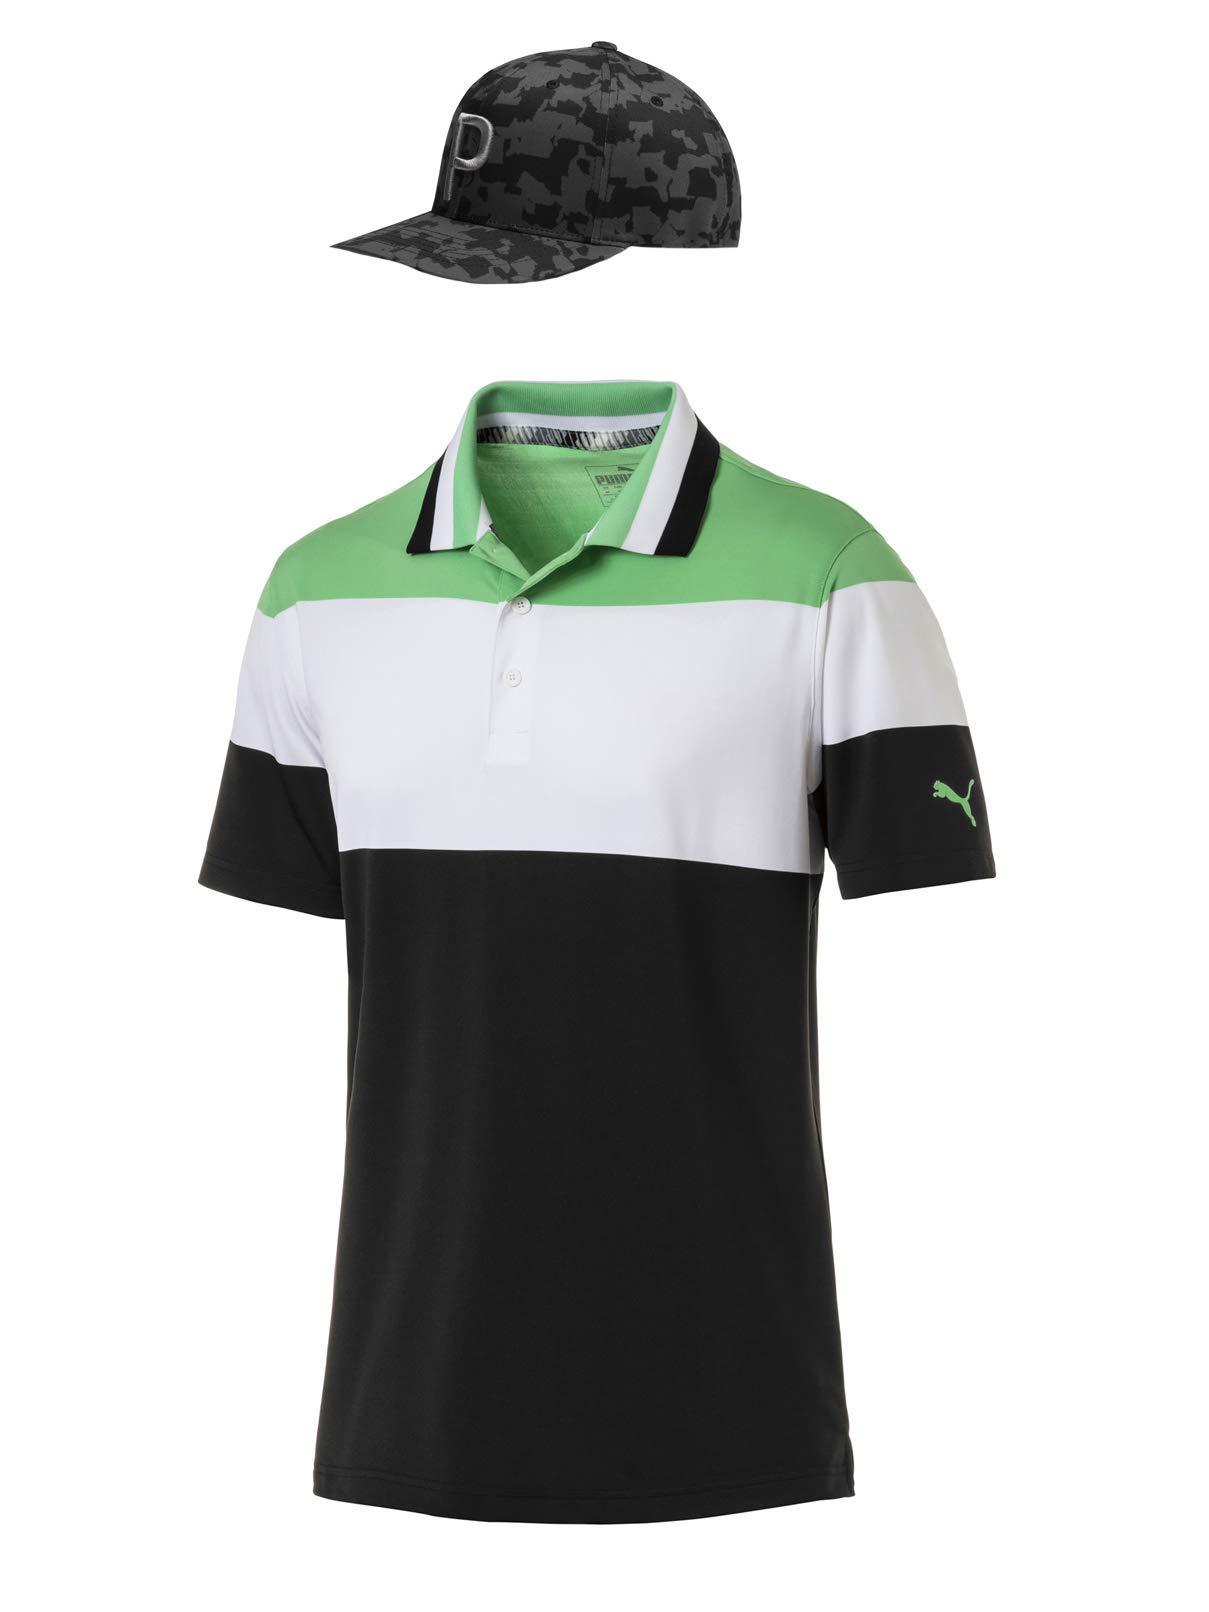 Rickie Fowler Masters Puma Golf Polo & Hat Bundle (2019)   Nineties Polo & P 110 Snapback ((Irish Green/Black Camo, Medium))